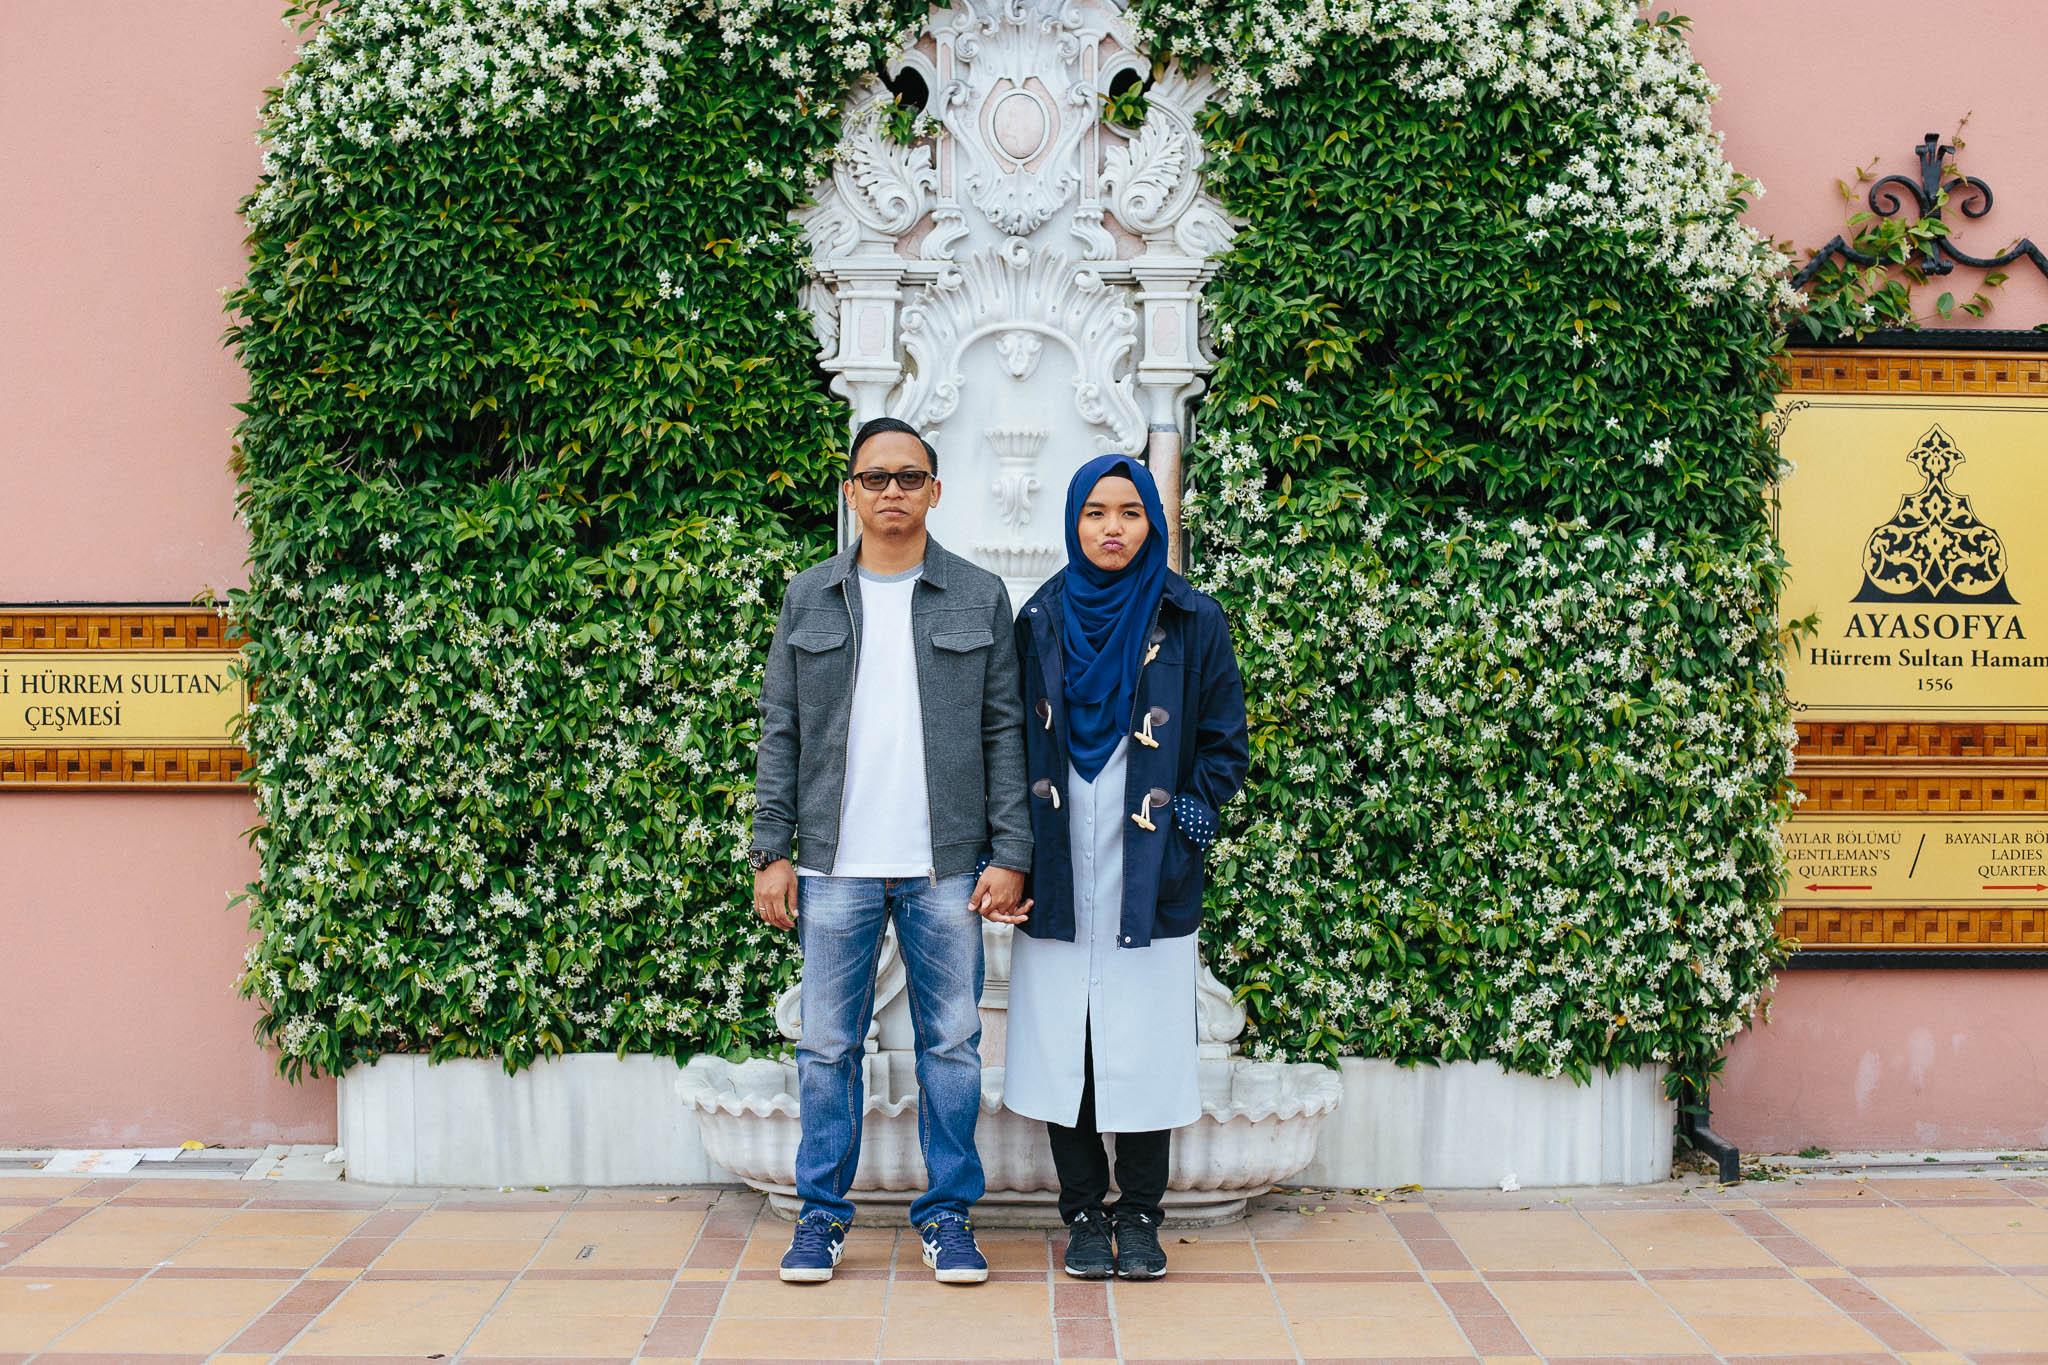 singapore-wedding-photographer-dzul-isma-istanbul-wmt-19.jpg